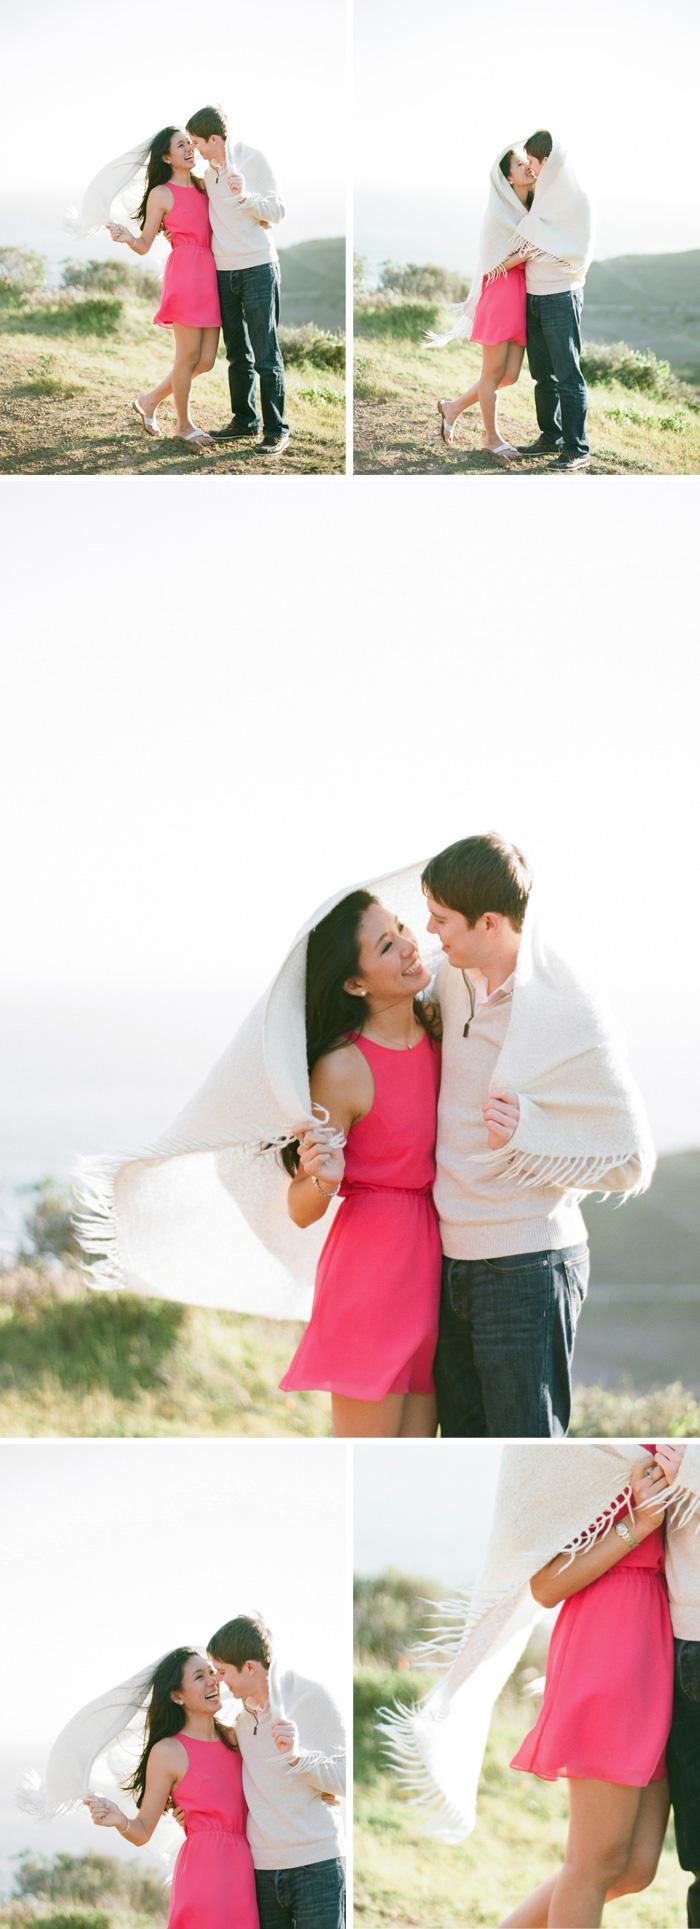 Sylvie-Gil-Engagement-Film-Photography-pink-couple-blanket.jpg